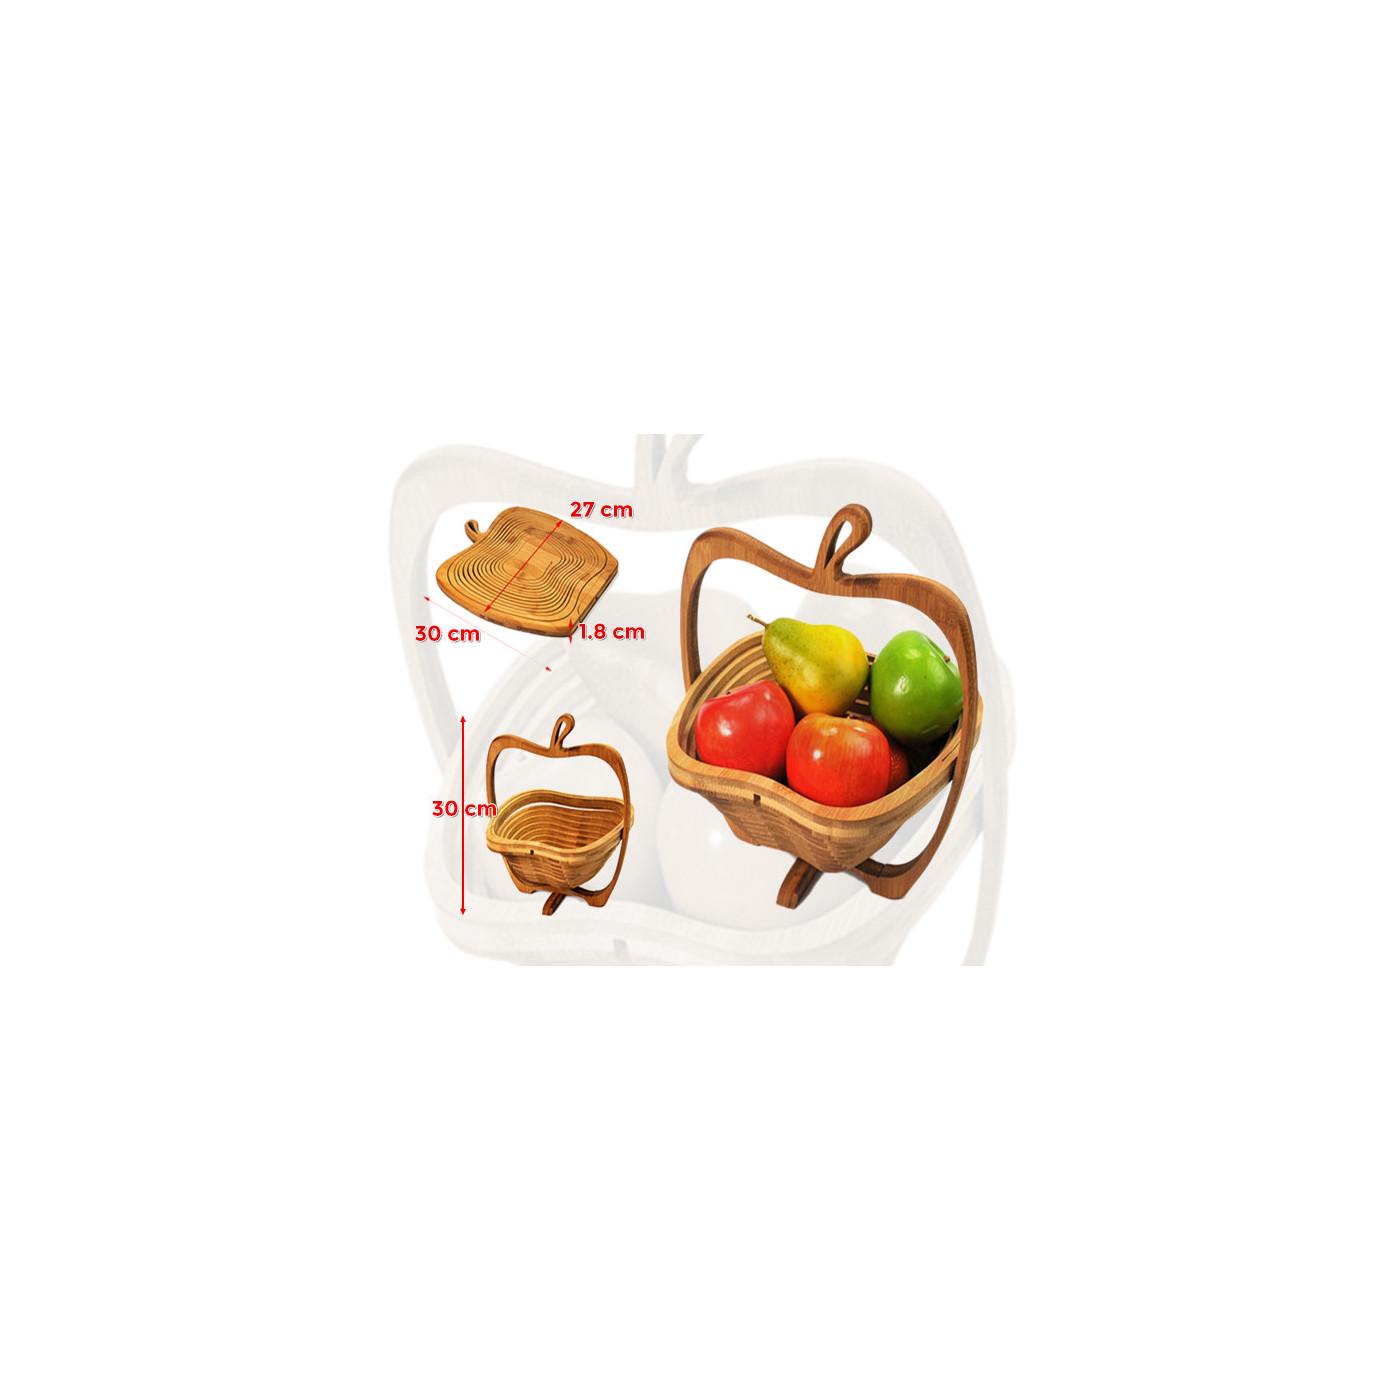 Frutero de madera Deco (plegable)  - 1